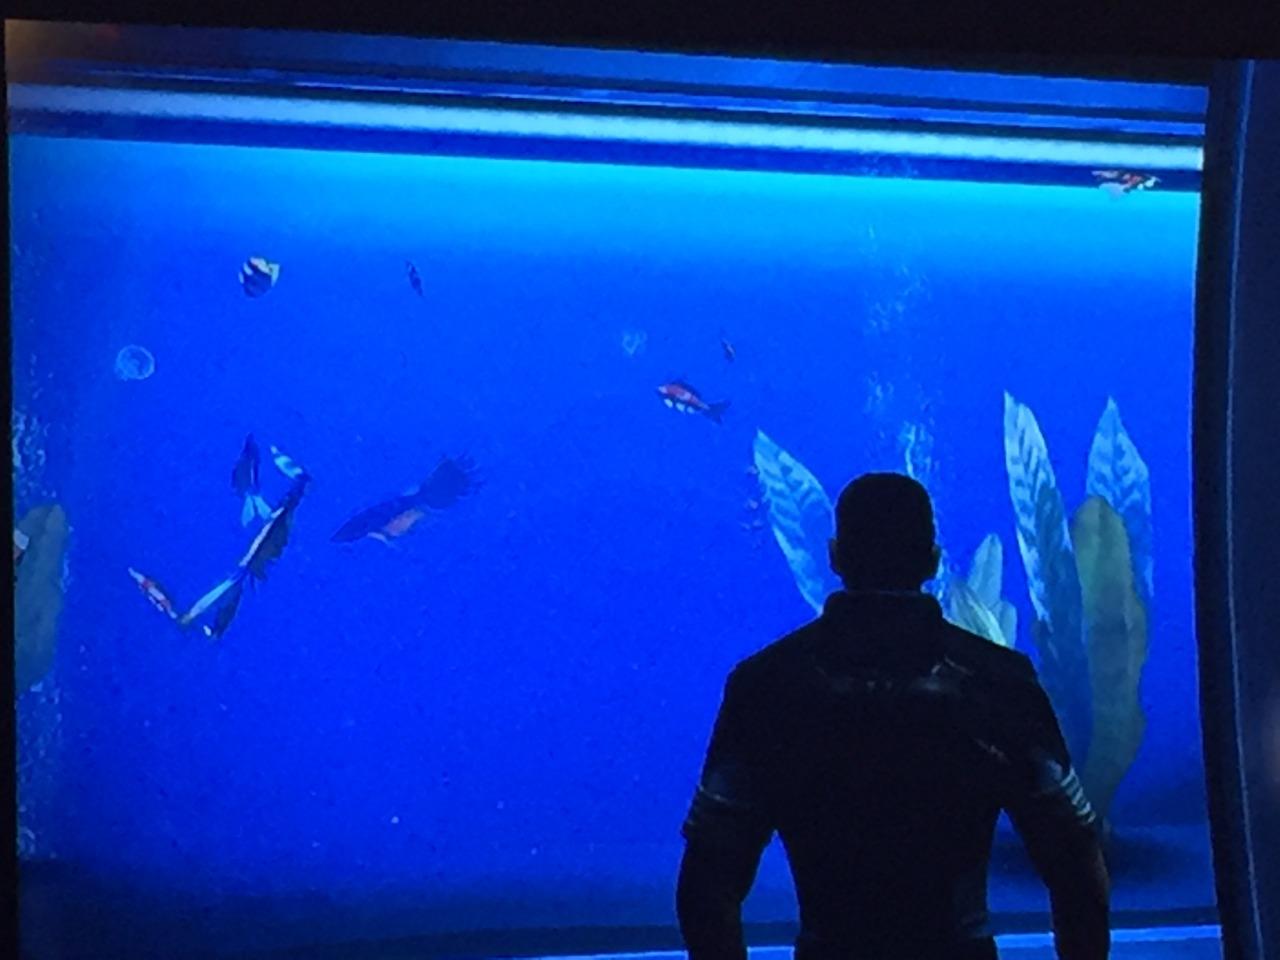 spacefish